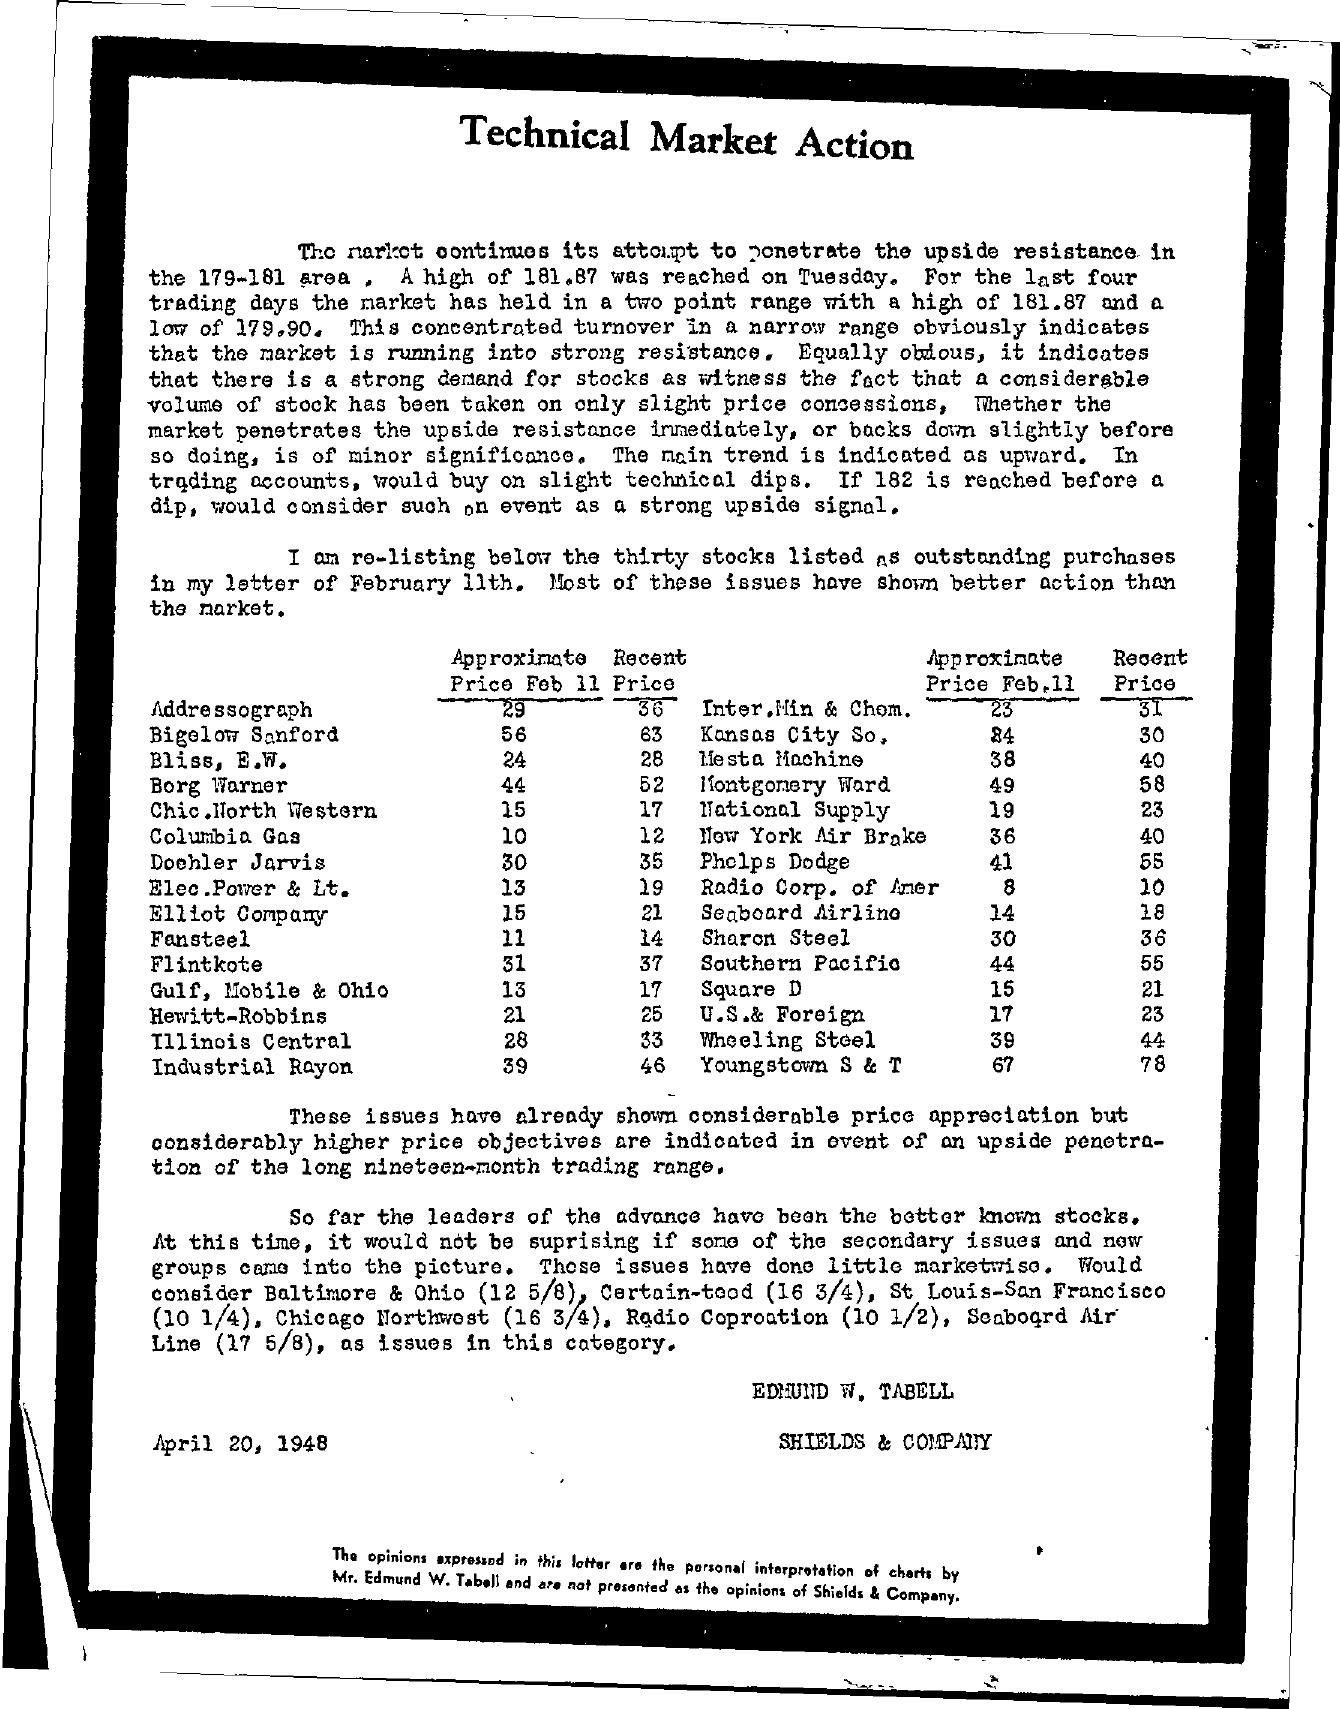 Tabell's Market Letter - April 20, 1948